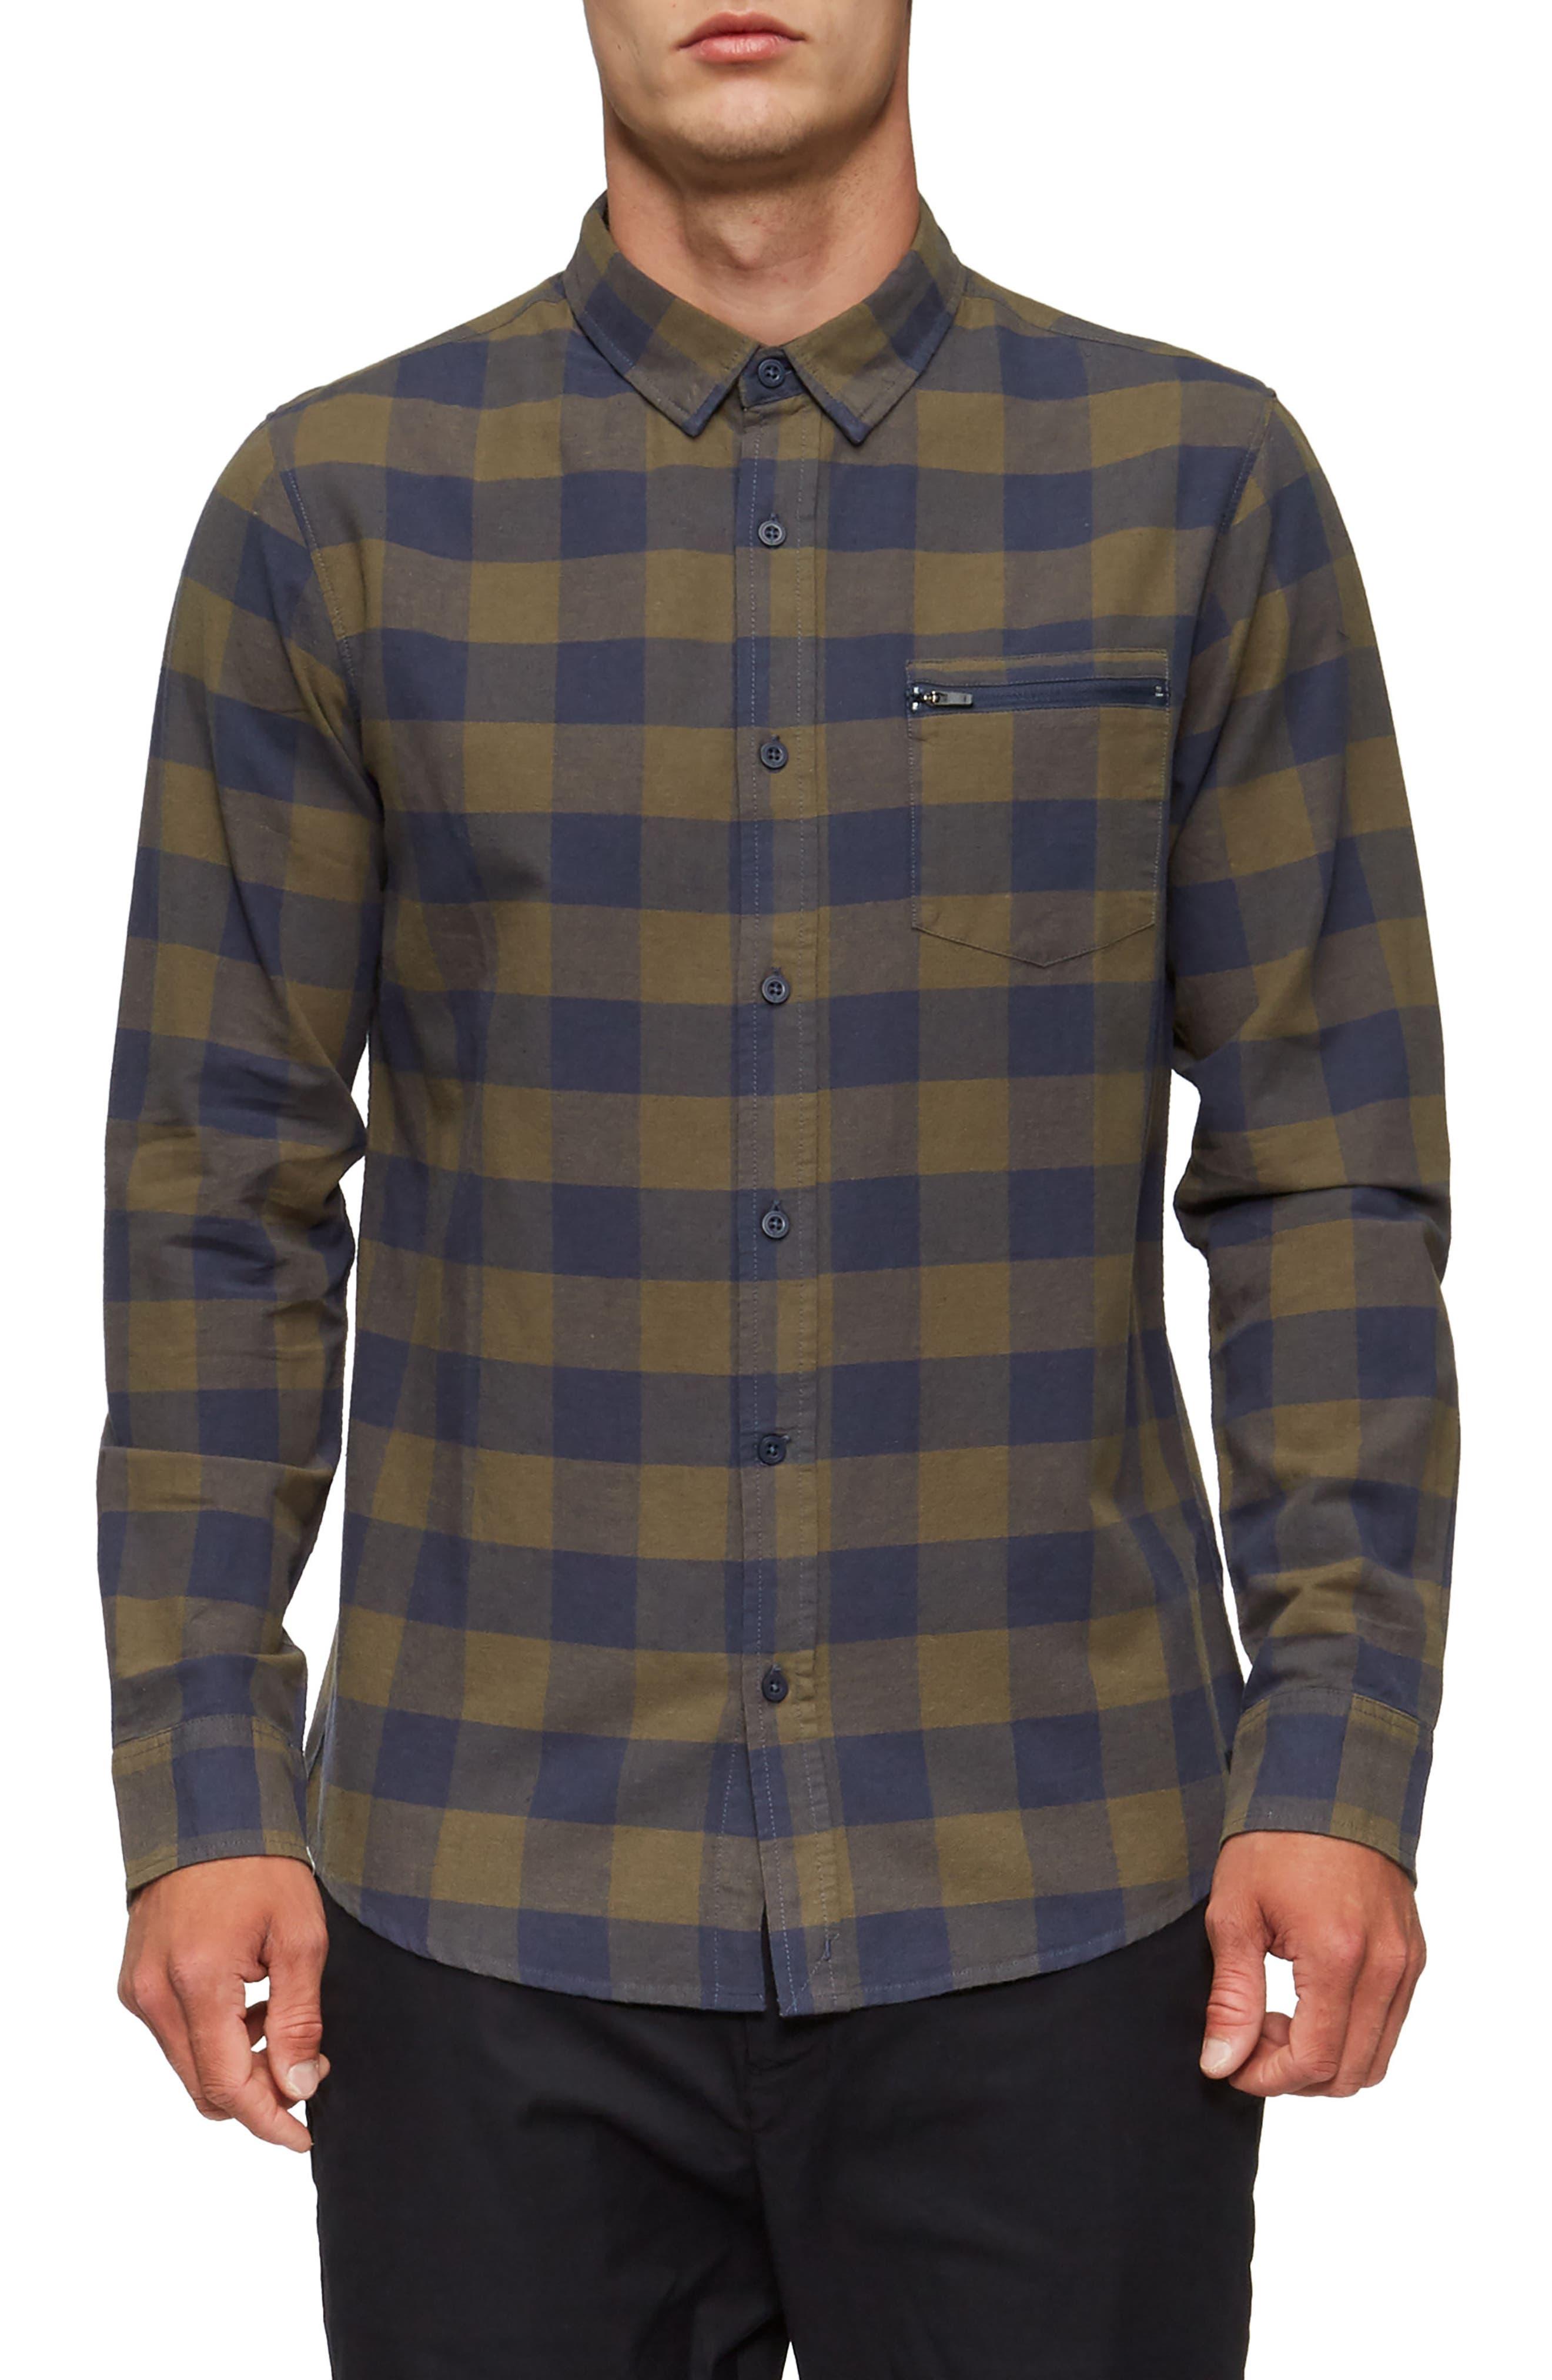 Cohen Long-Sleeve Shirt,                             Main thumbnail 1, color,                             Shadow Blue/ Olive